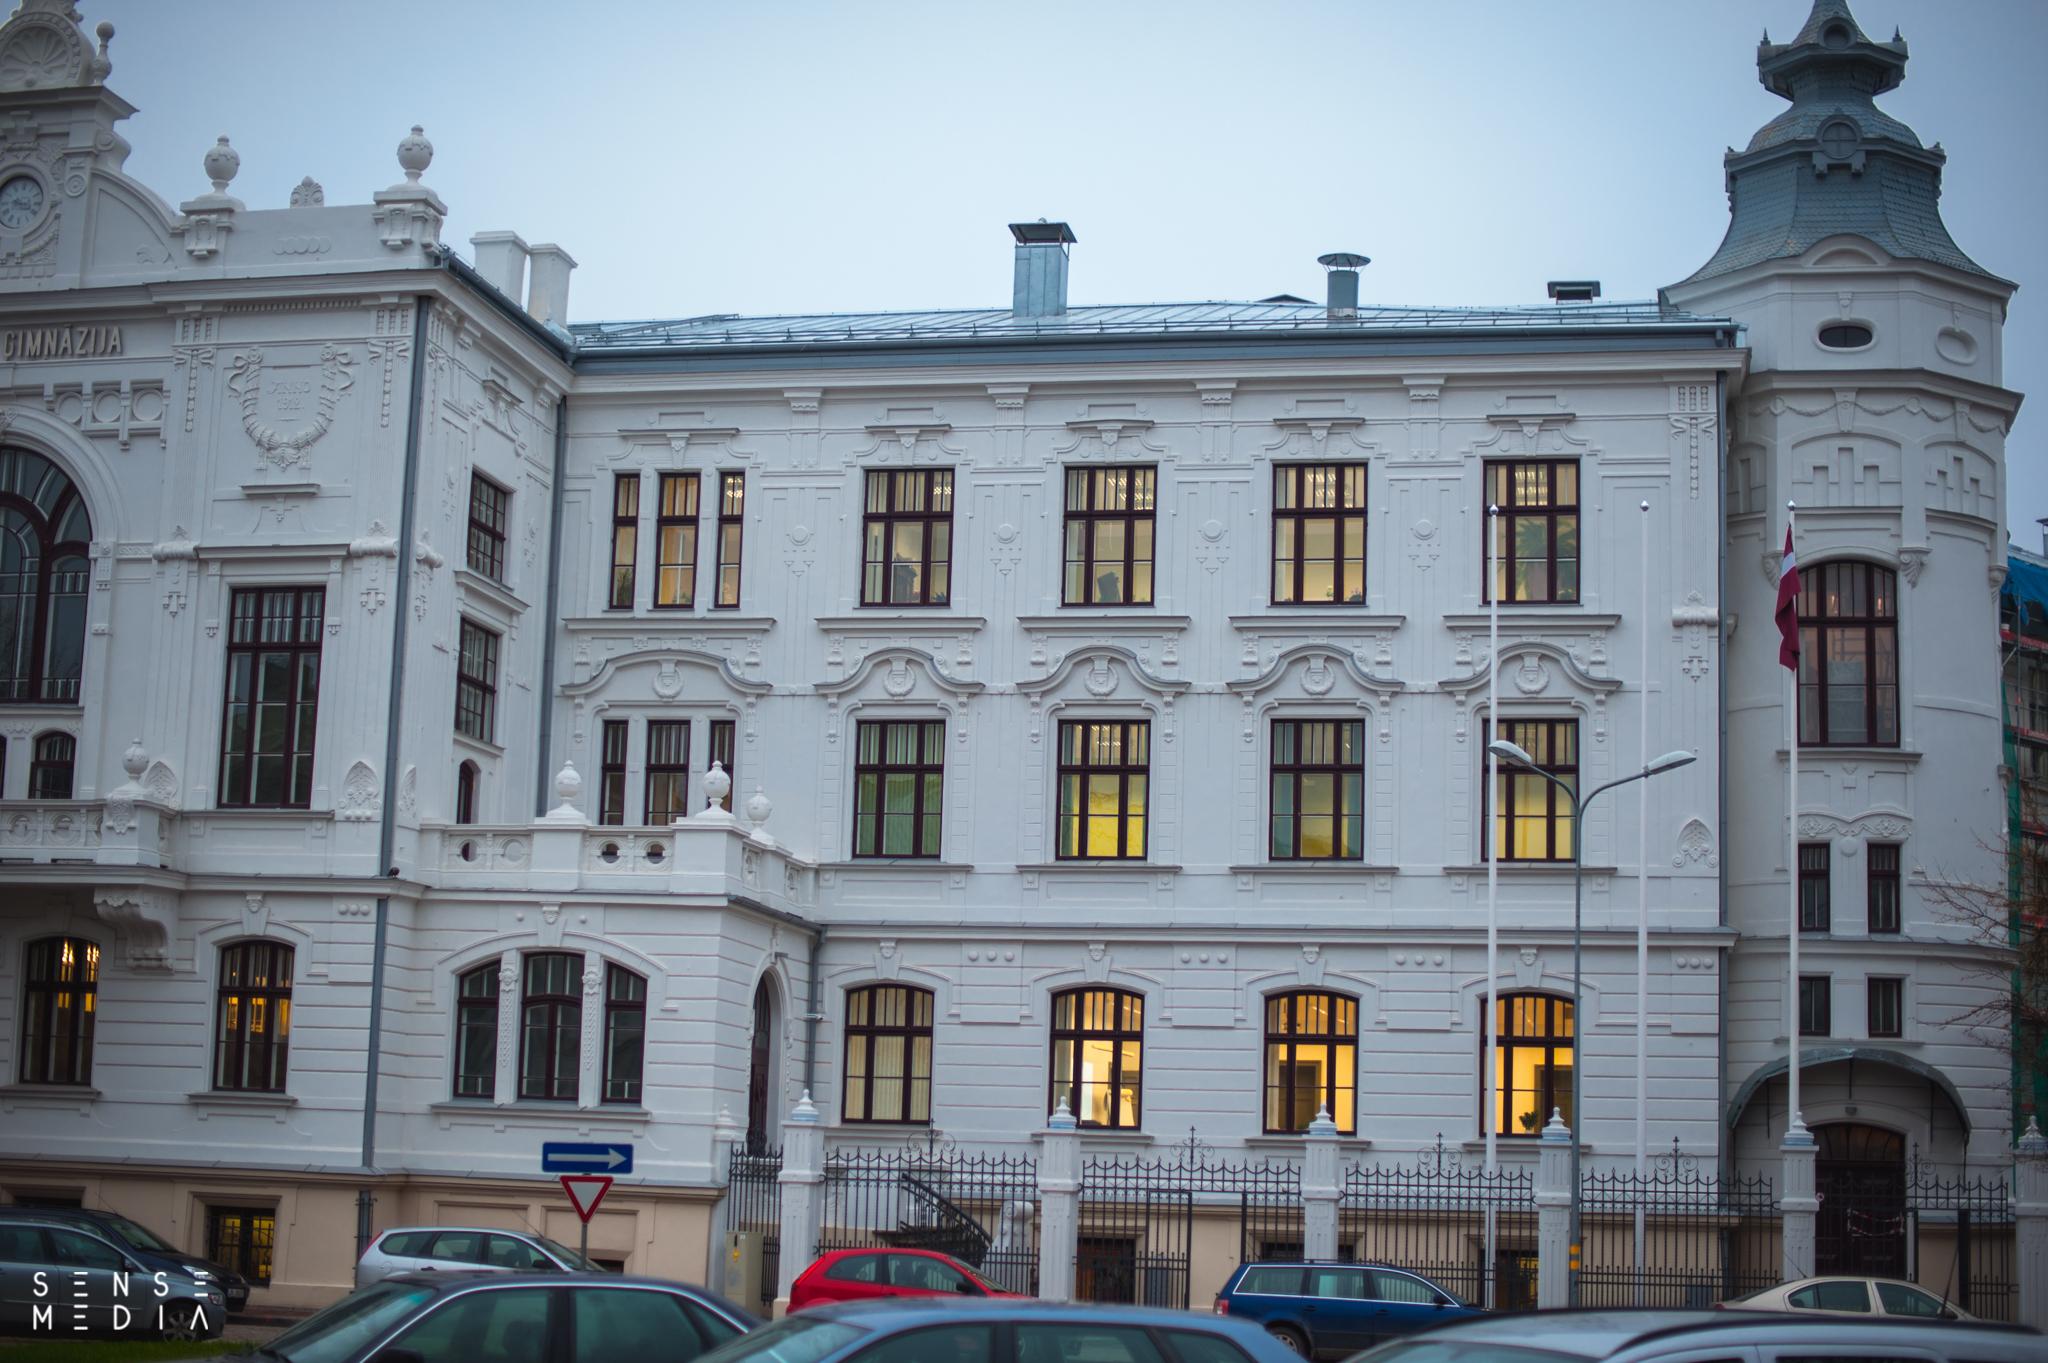 2014.11.25-28 First Transnational Partner-Meeting in Klaipeda (LT) & Liepaja (LV)